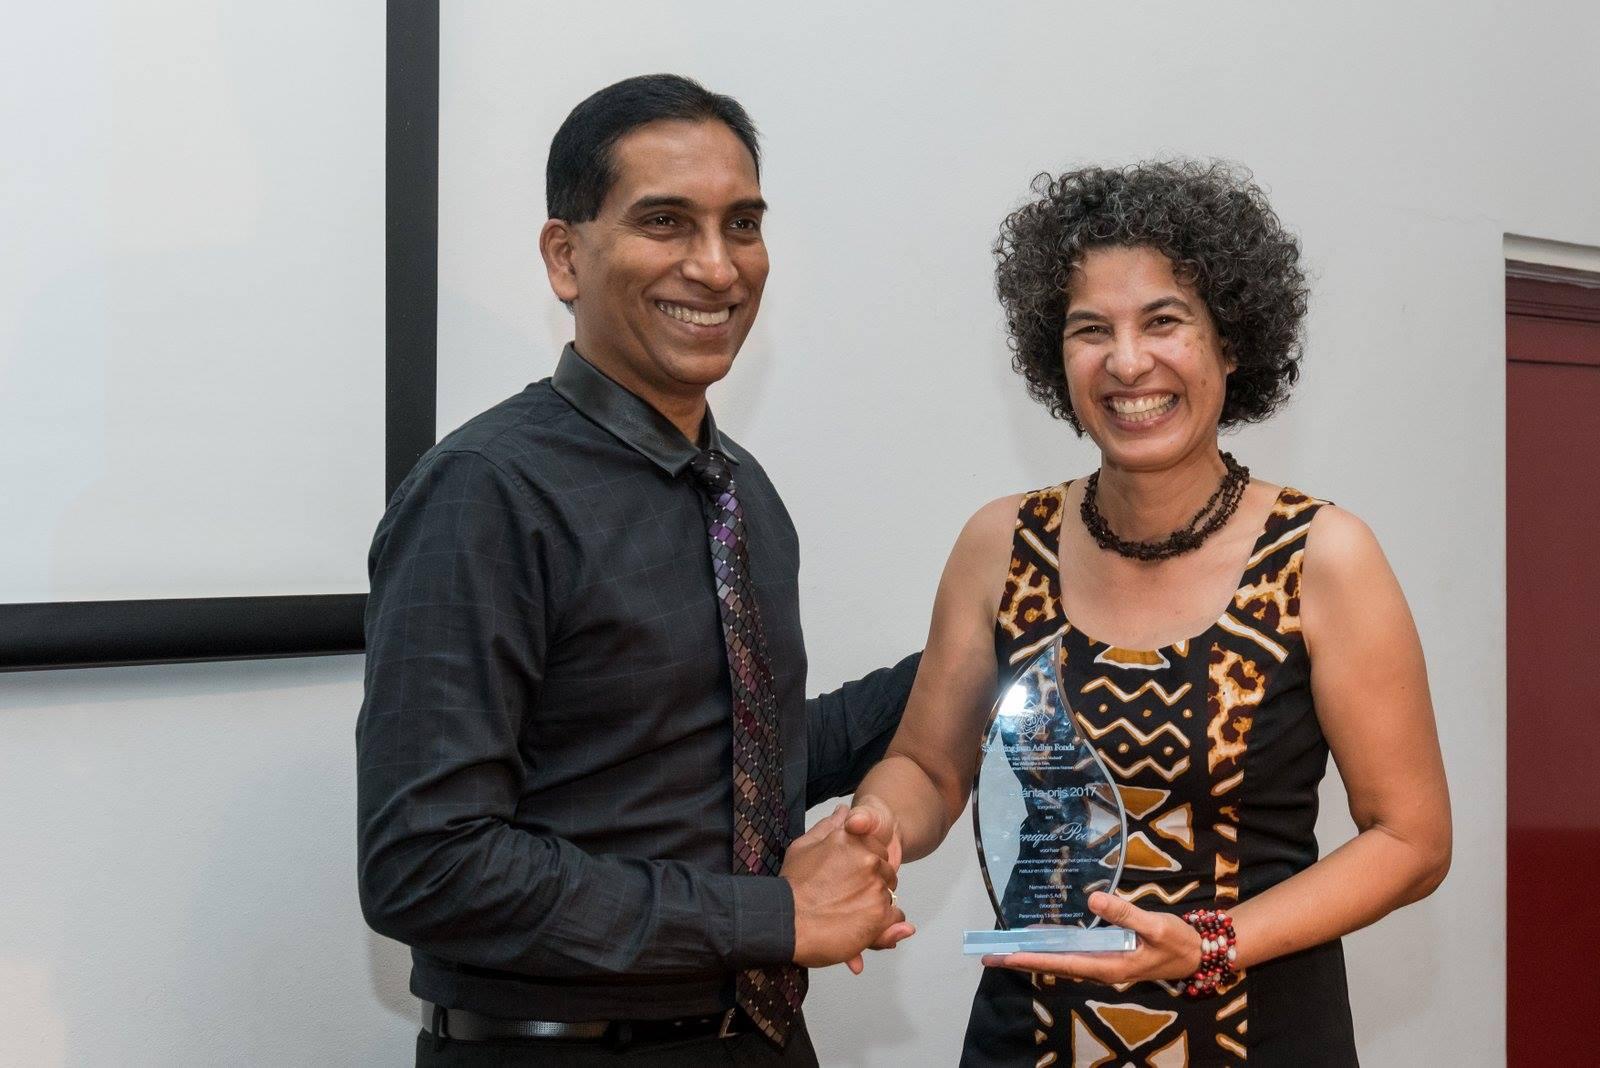 FamilieNieuws prijs Suriname Monique Pool